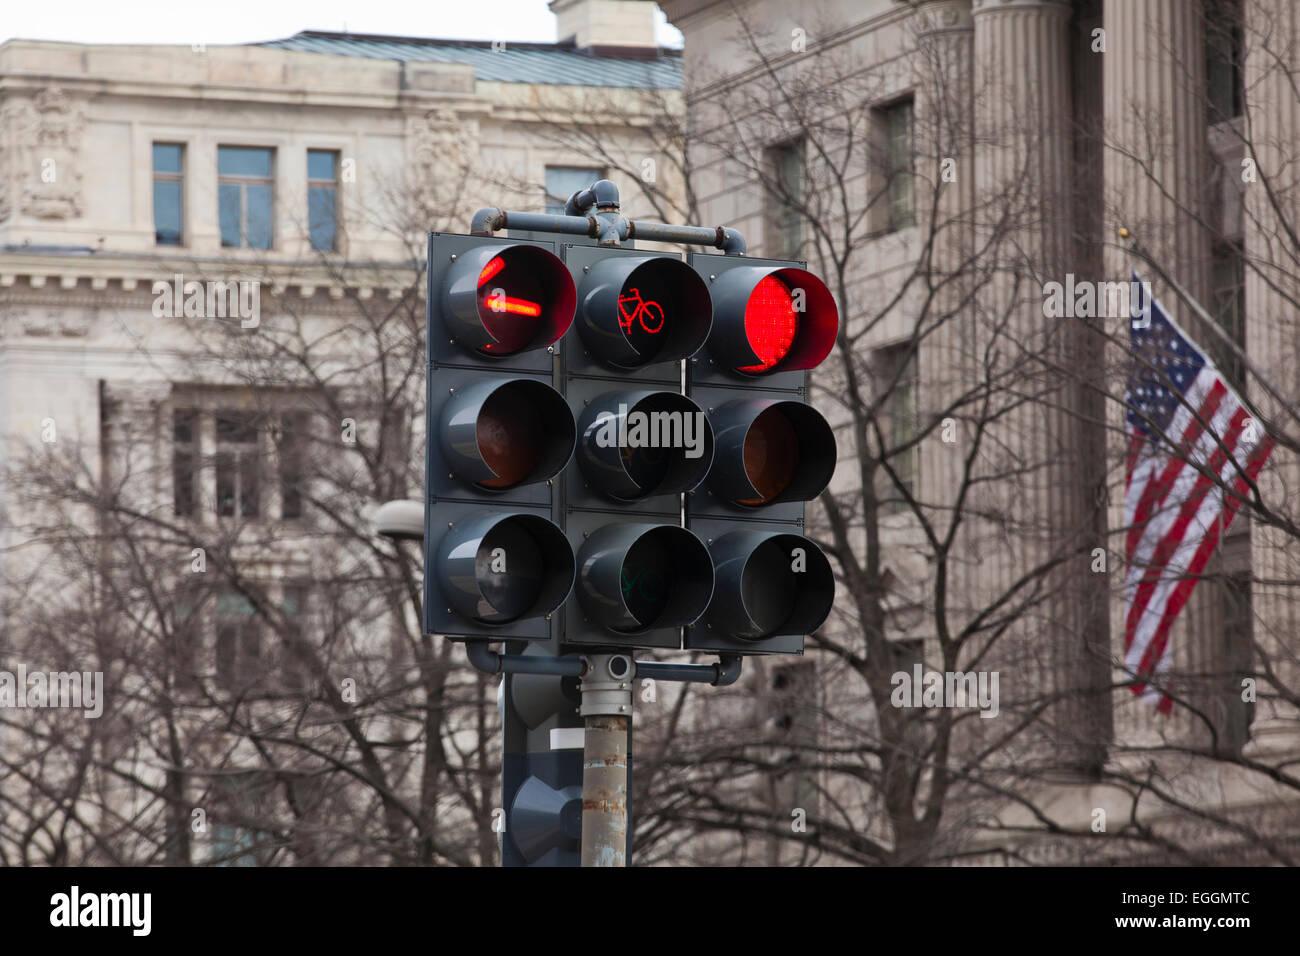 Traffic lights (traffic signal lights) - USA - Stock Image